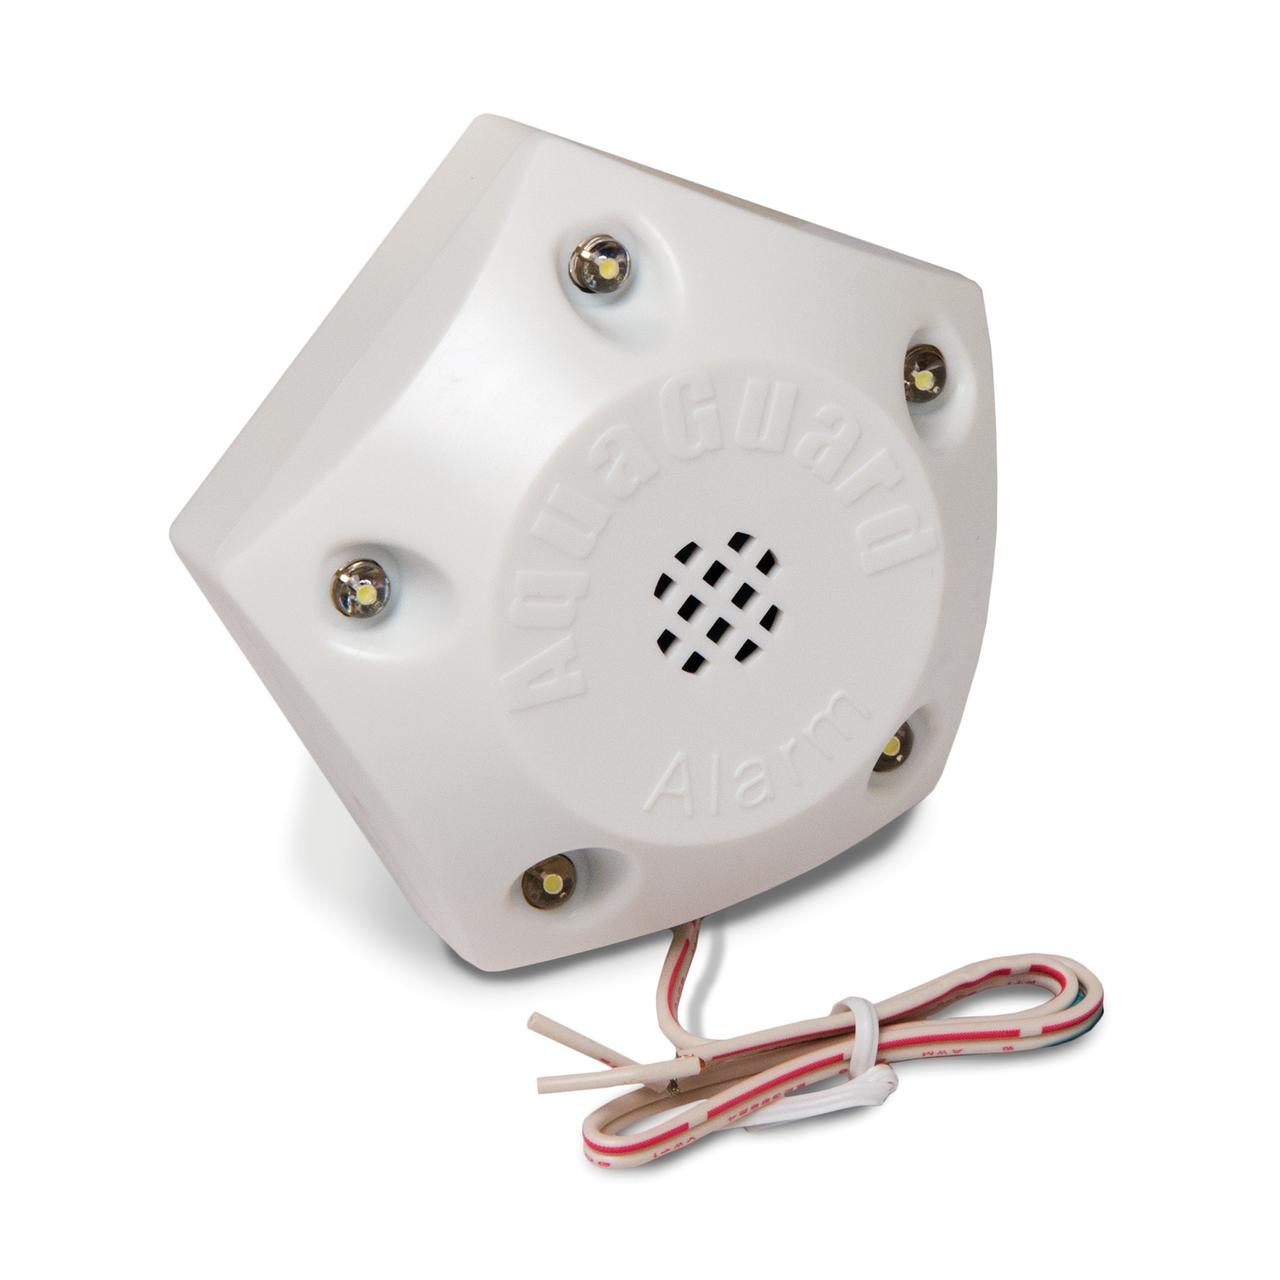 AG 9100 External Alarm